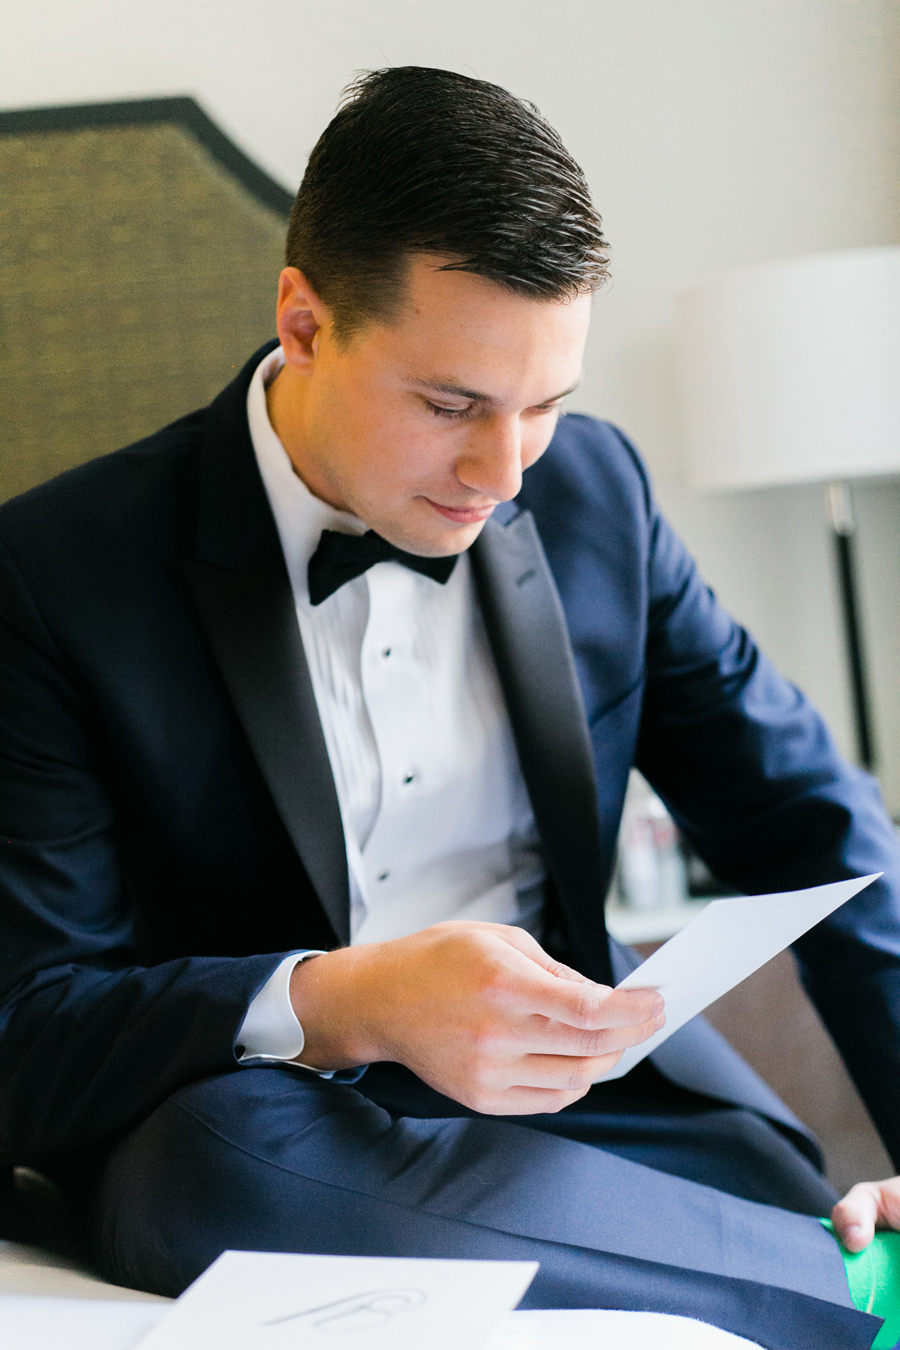 murphy-room-chicago-wedding-005